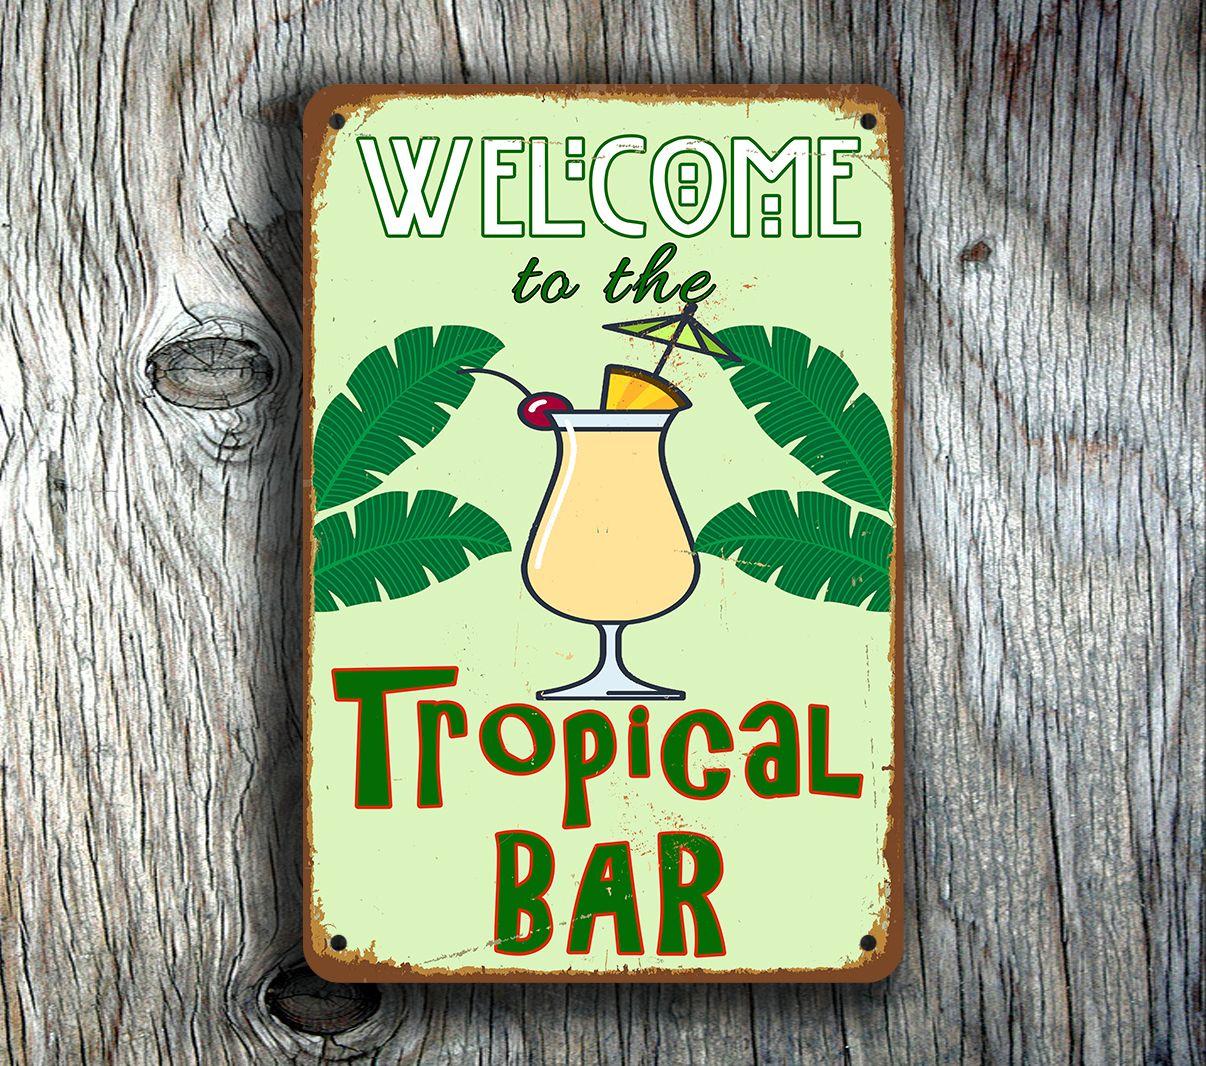 Bar Decor Signs Tropical Bar Sign  Home Bar Decor Httpwwwclassicmetalsigns